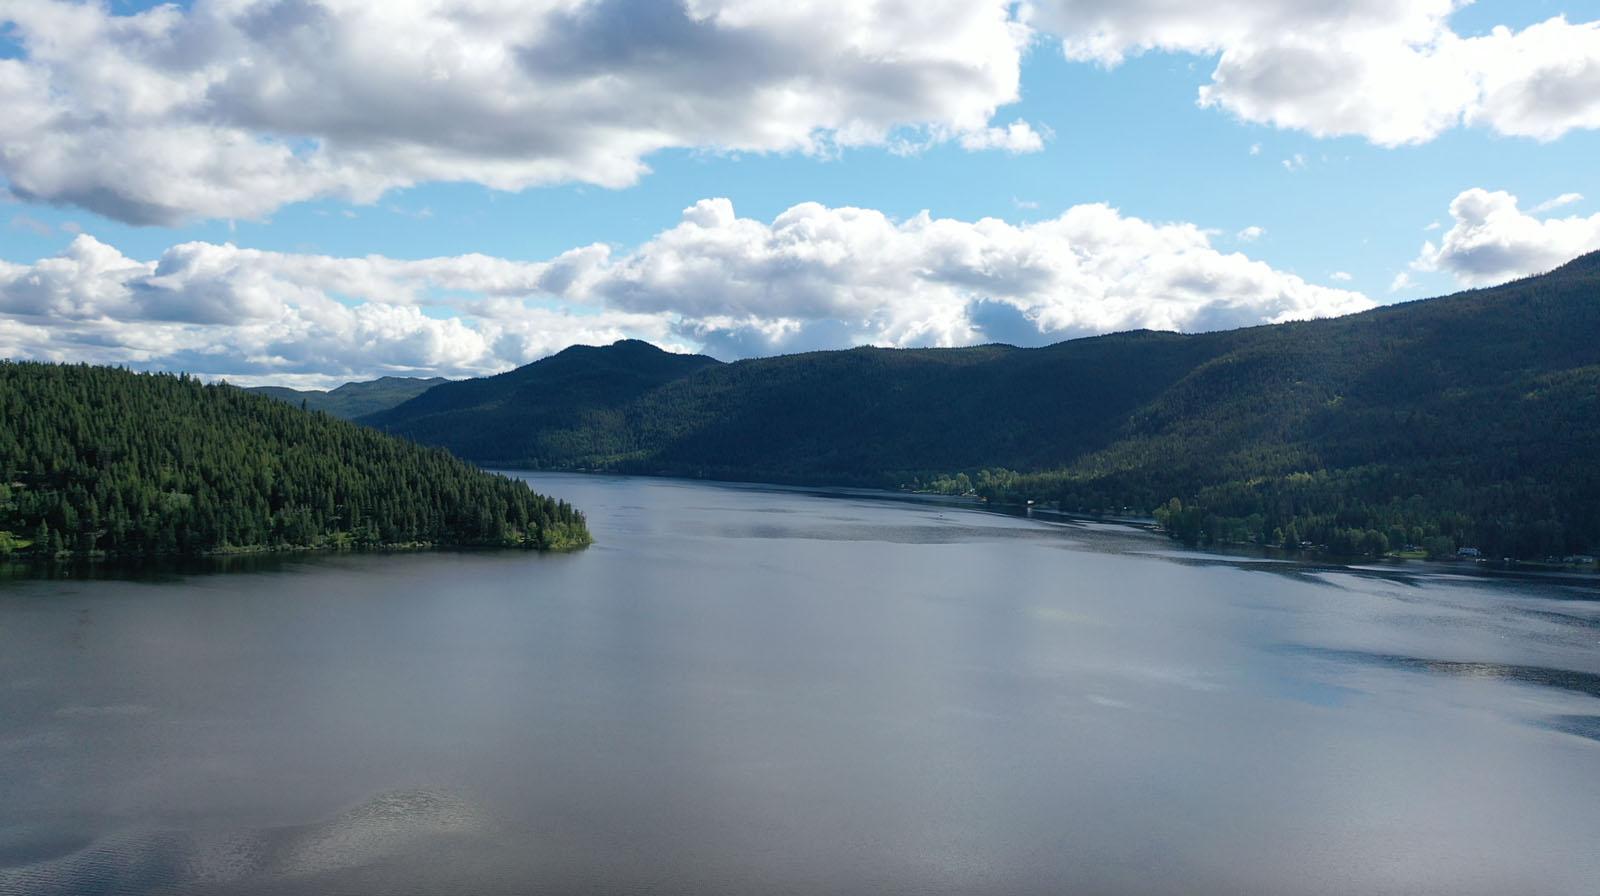 Canim lake resort 07